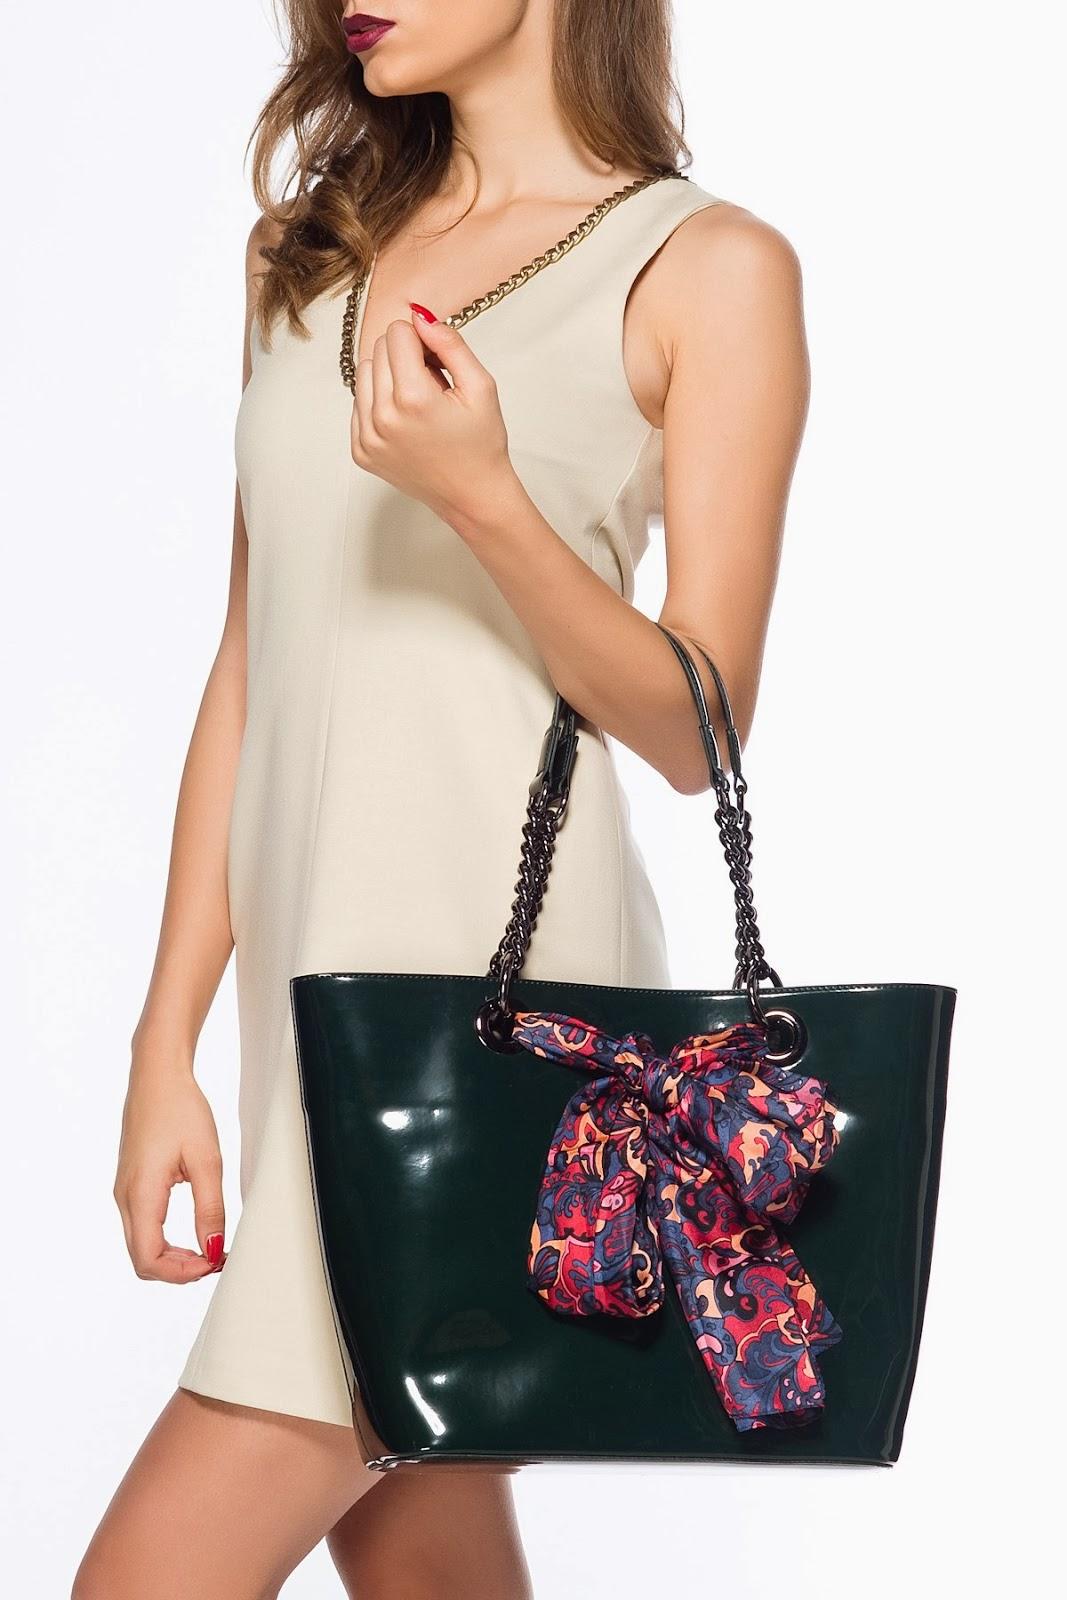 sembrono  dkny ladies bag models  models 2014 summer